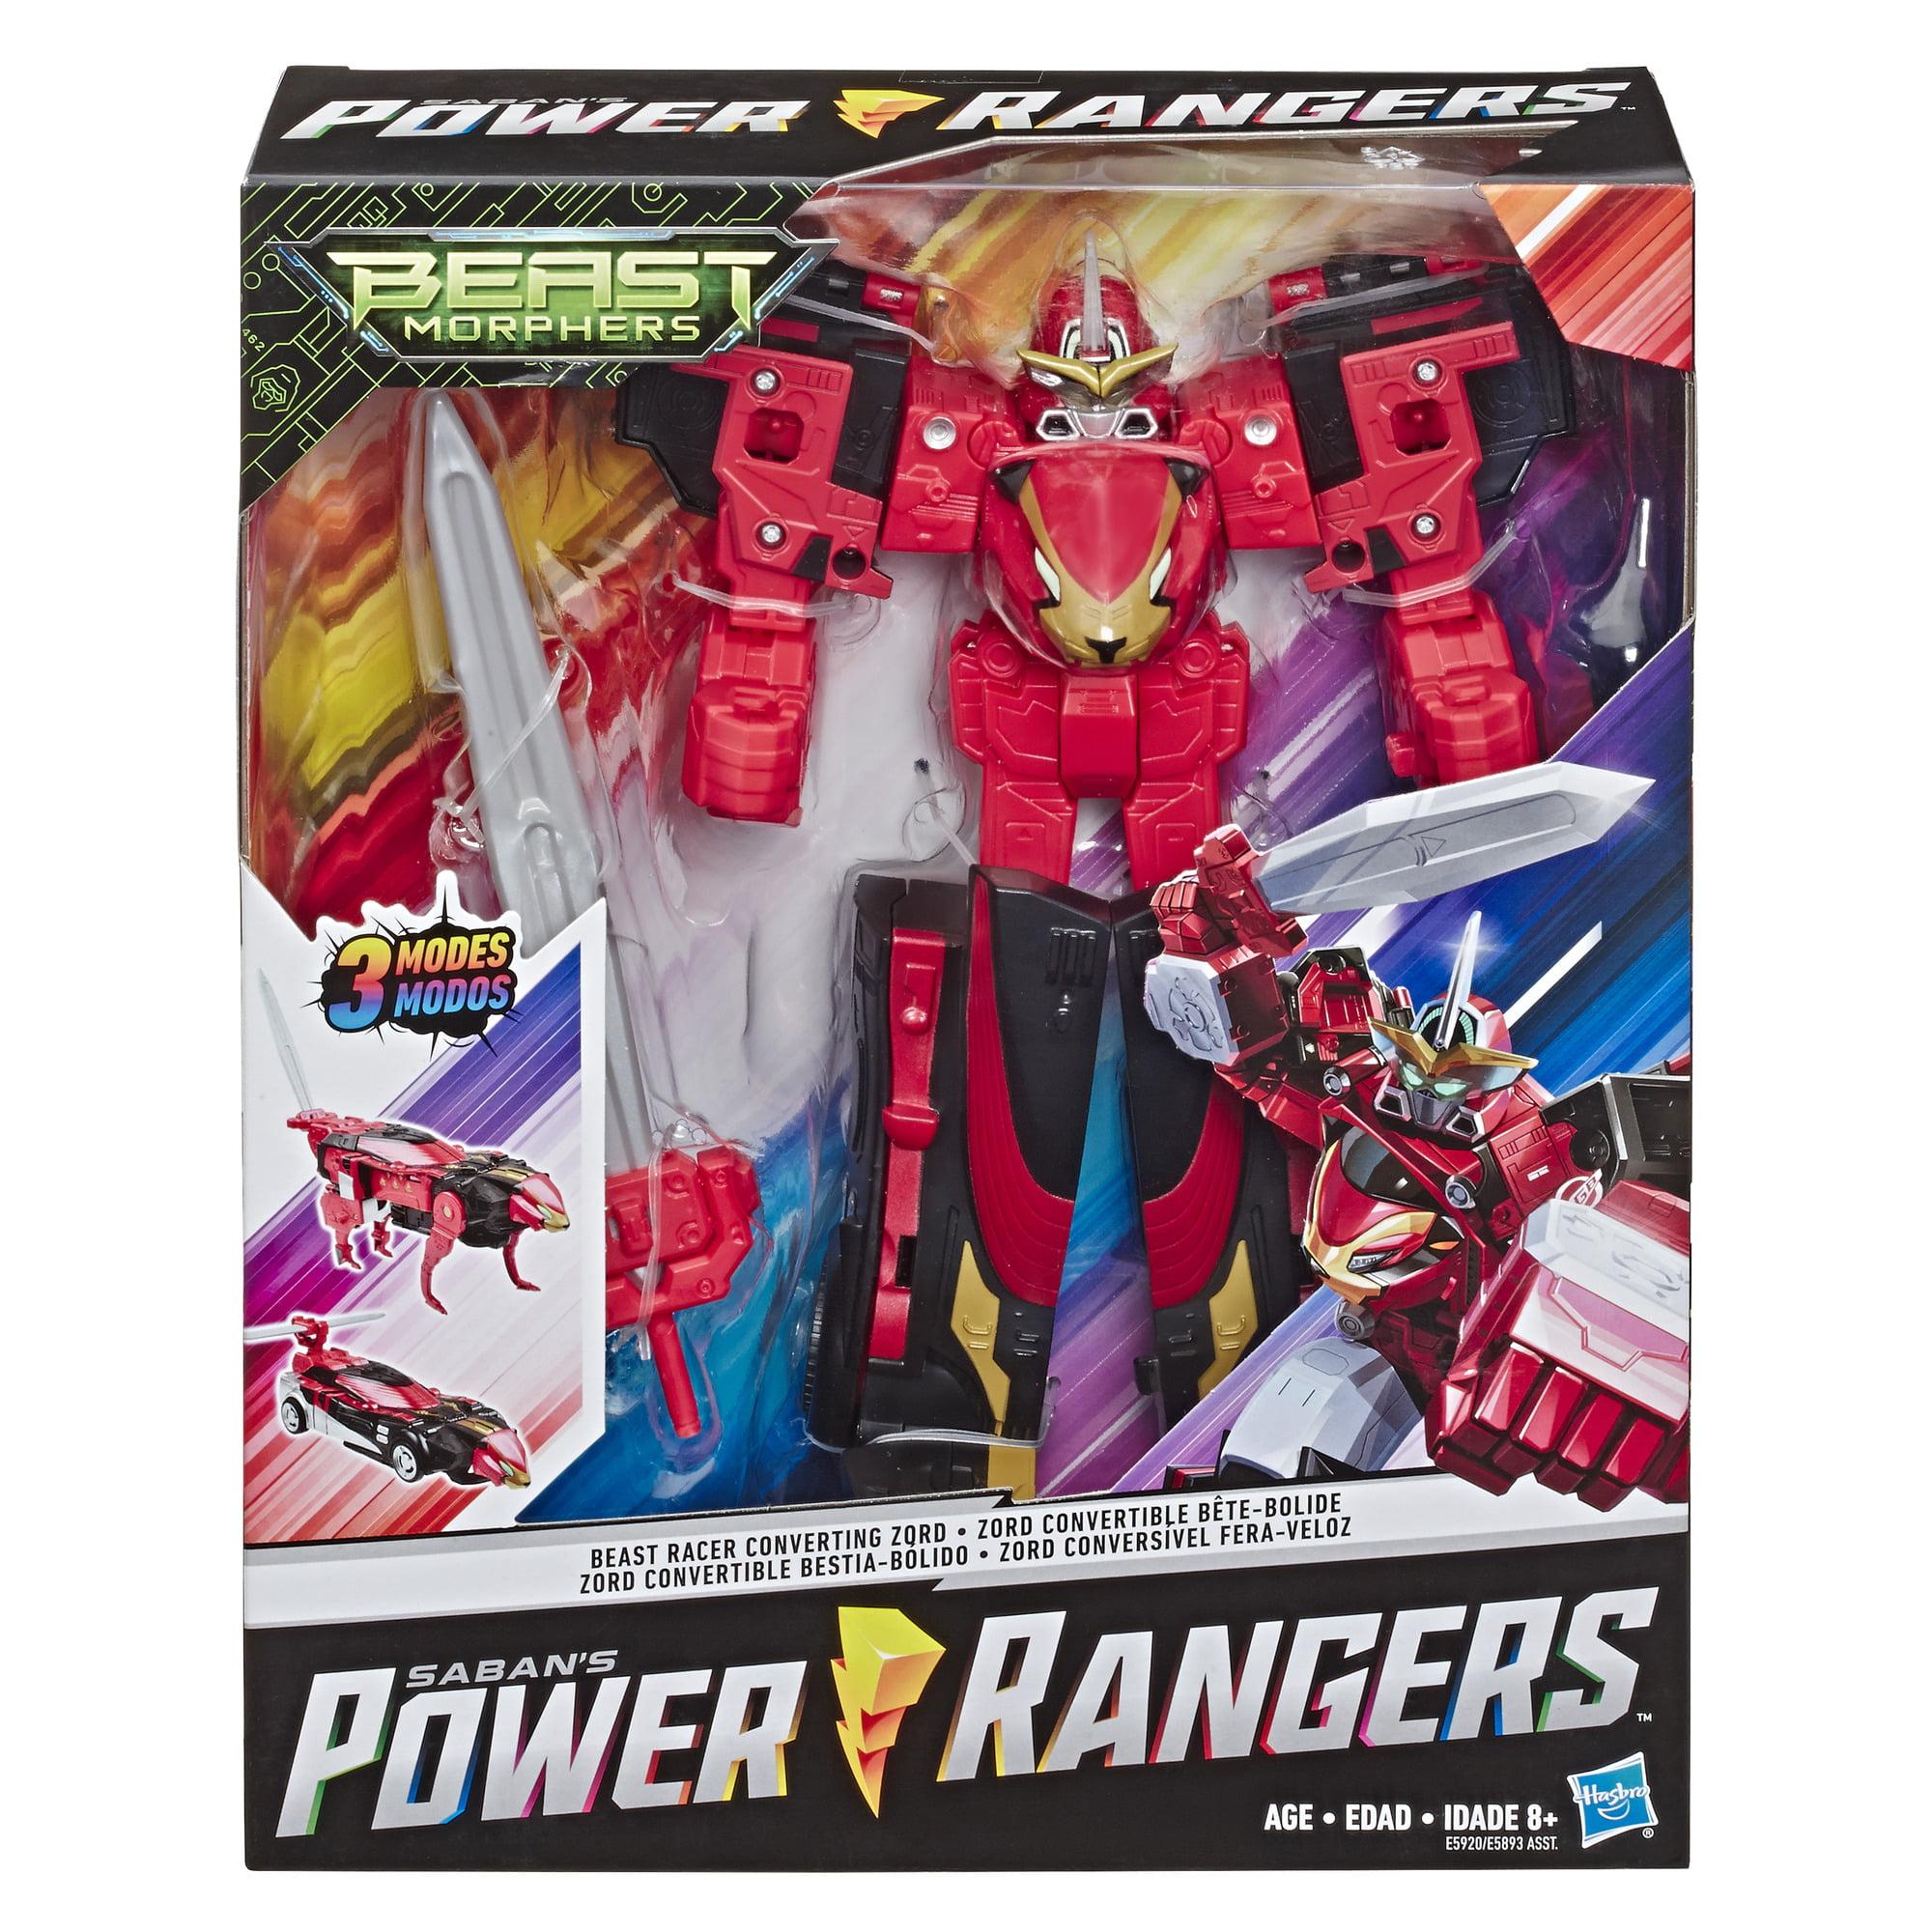 Power Rangers NEW Megazord Beast Morphers Action Figure Toy Beast Racer Zord